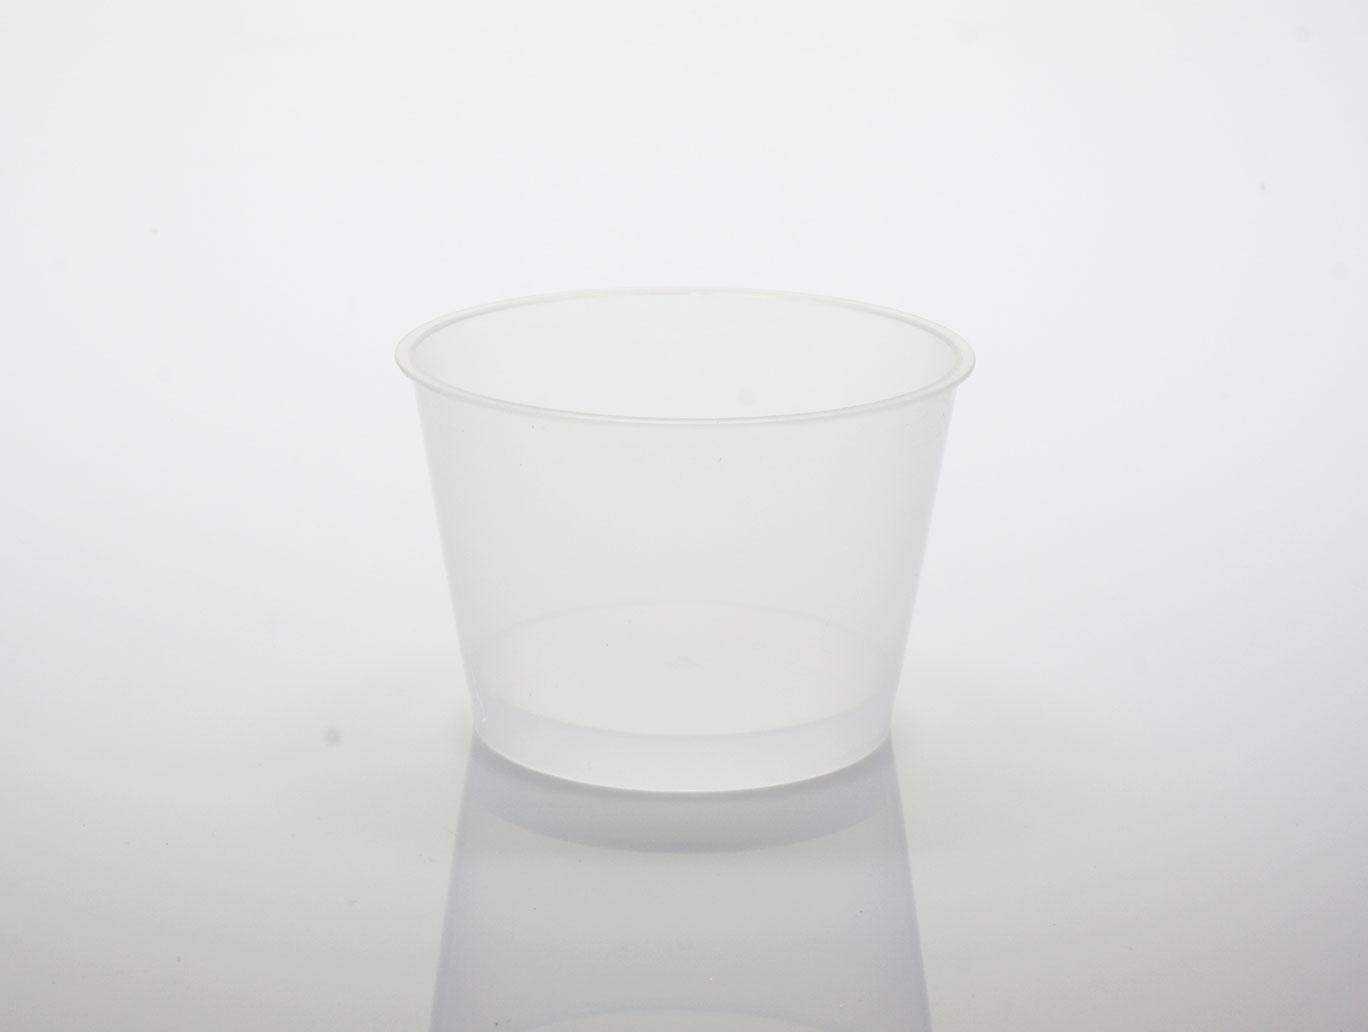 【BS75】布丁燒、布丁杯、烤布丁、PP杯、耐熱杯、耐烤杯、奶酪杯、中圓杯(25個+蓋)